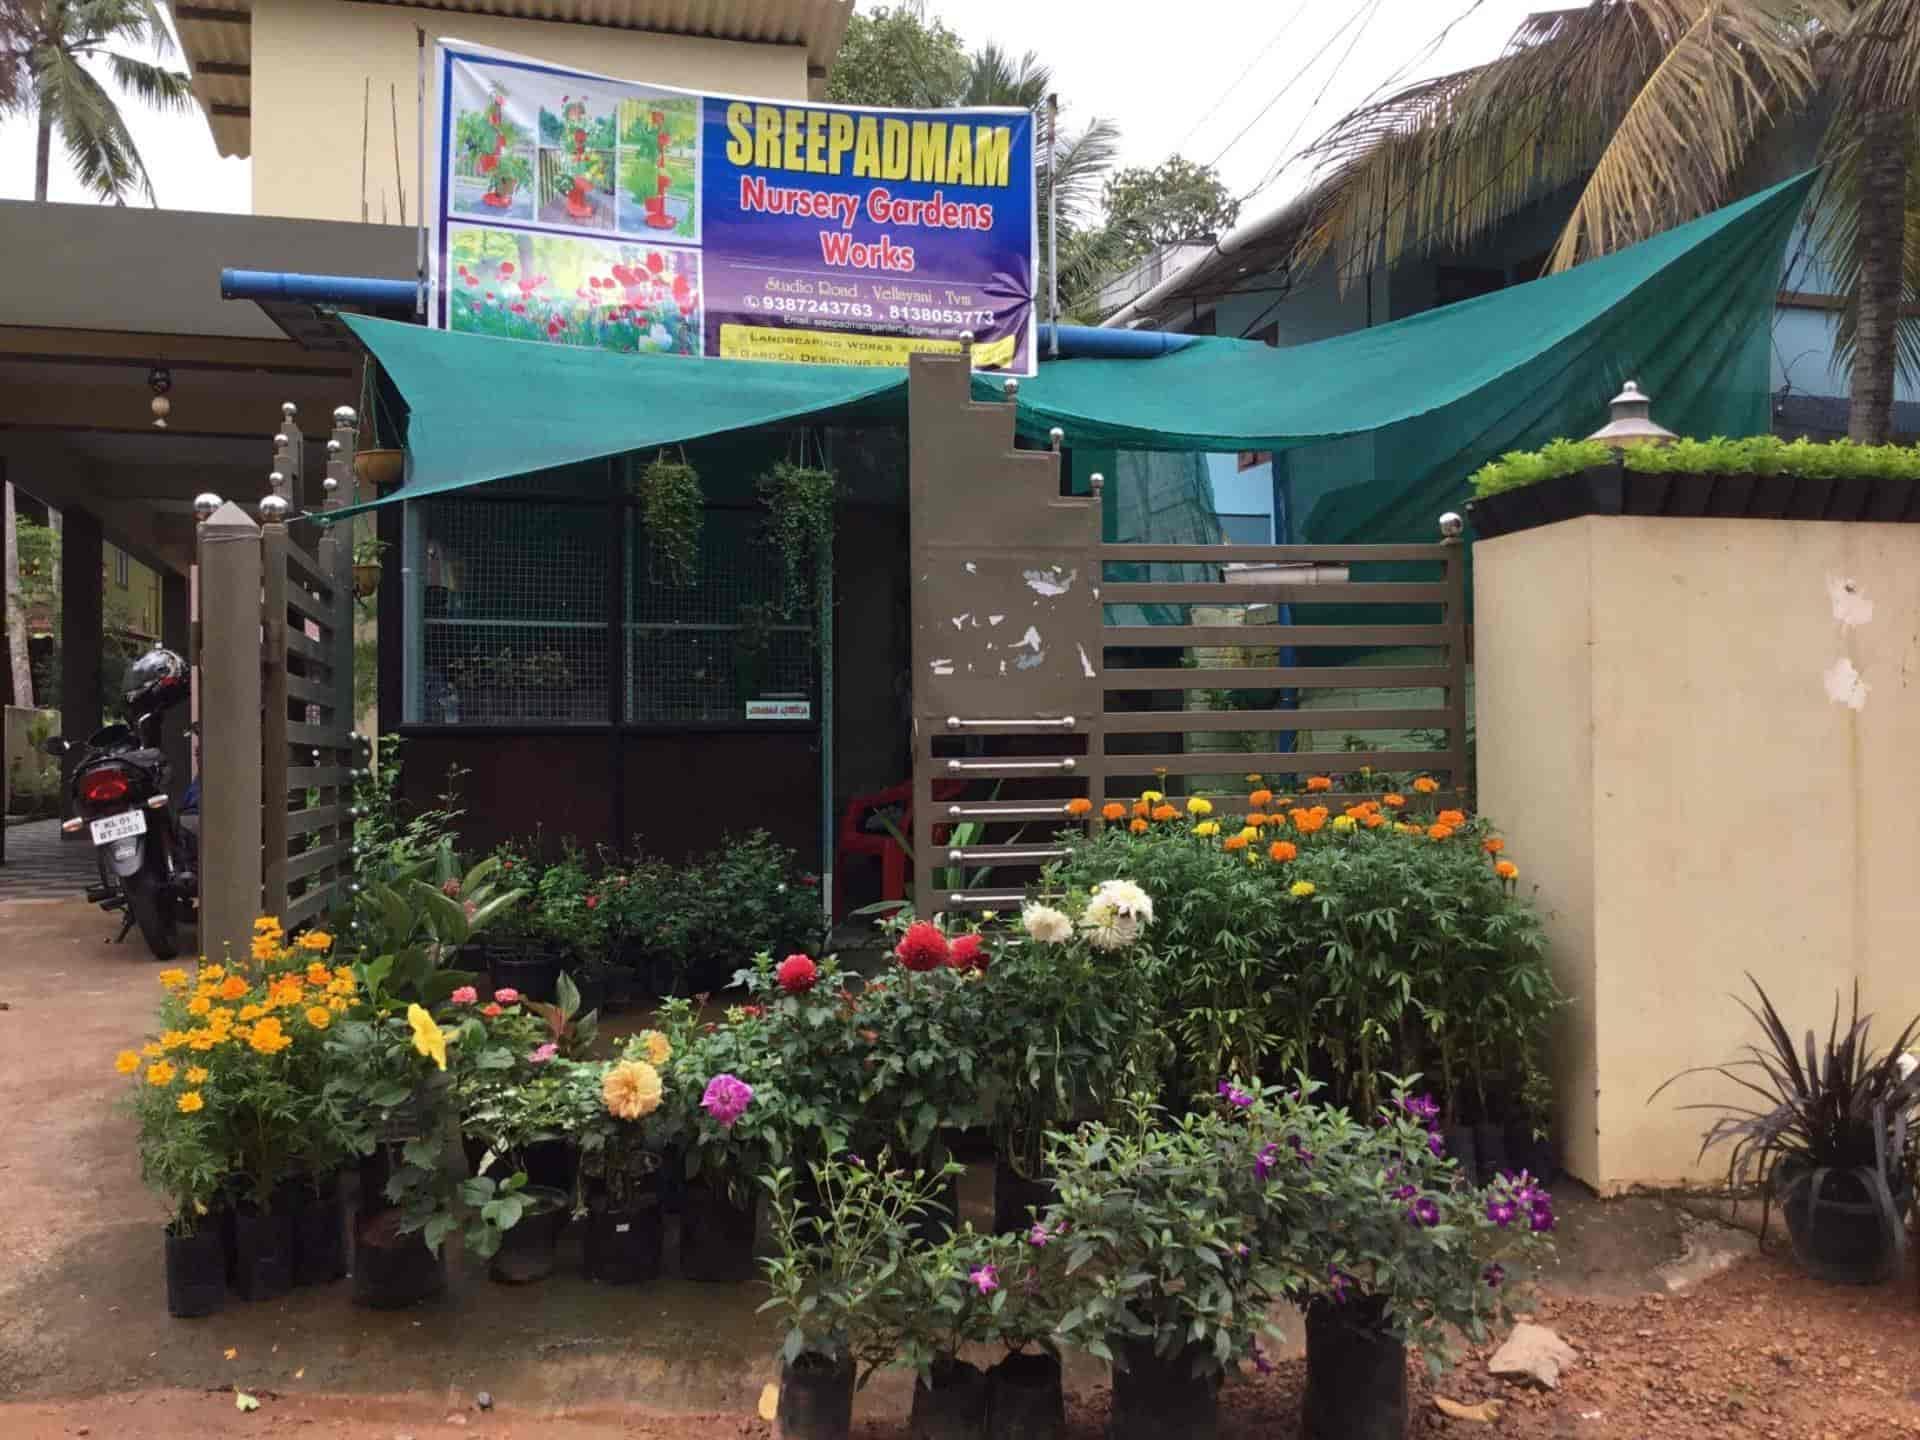 Sreepadmam Nursery Gardens Works